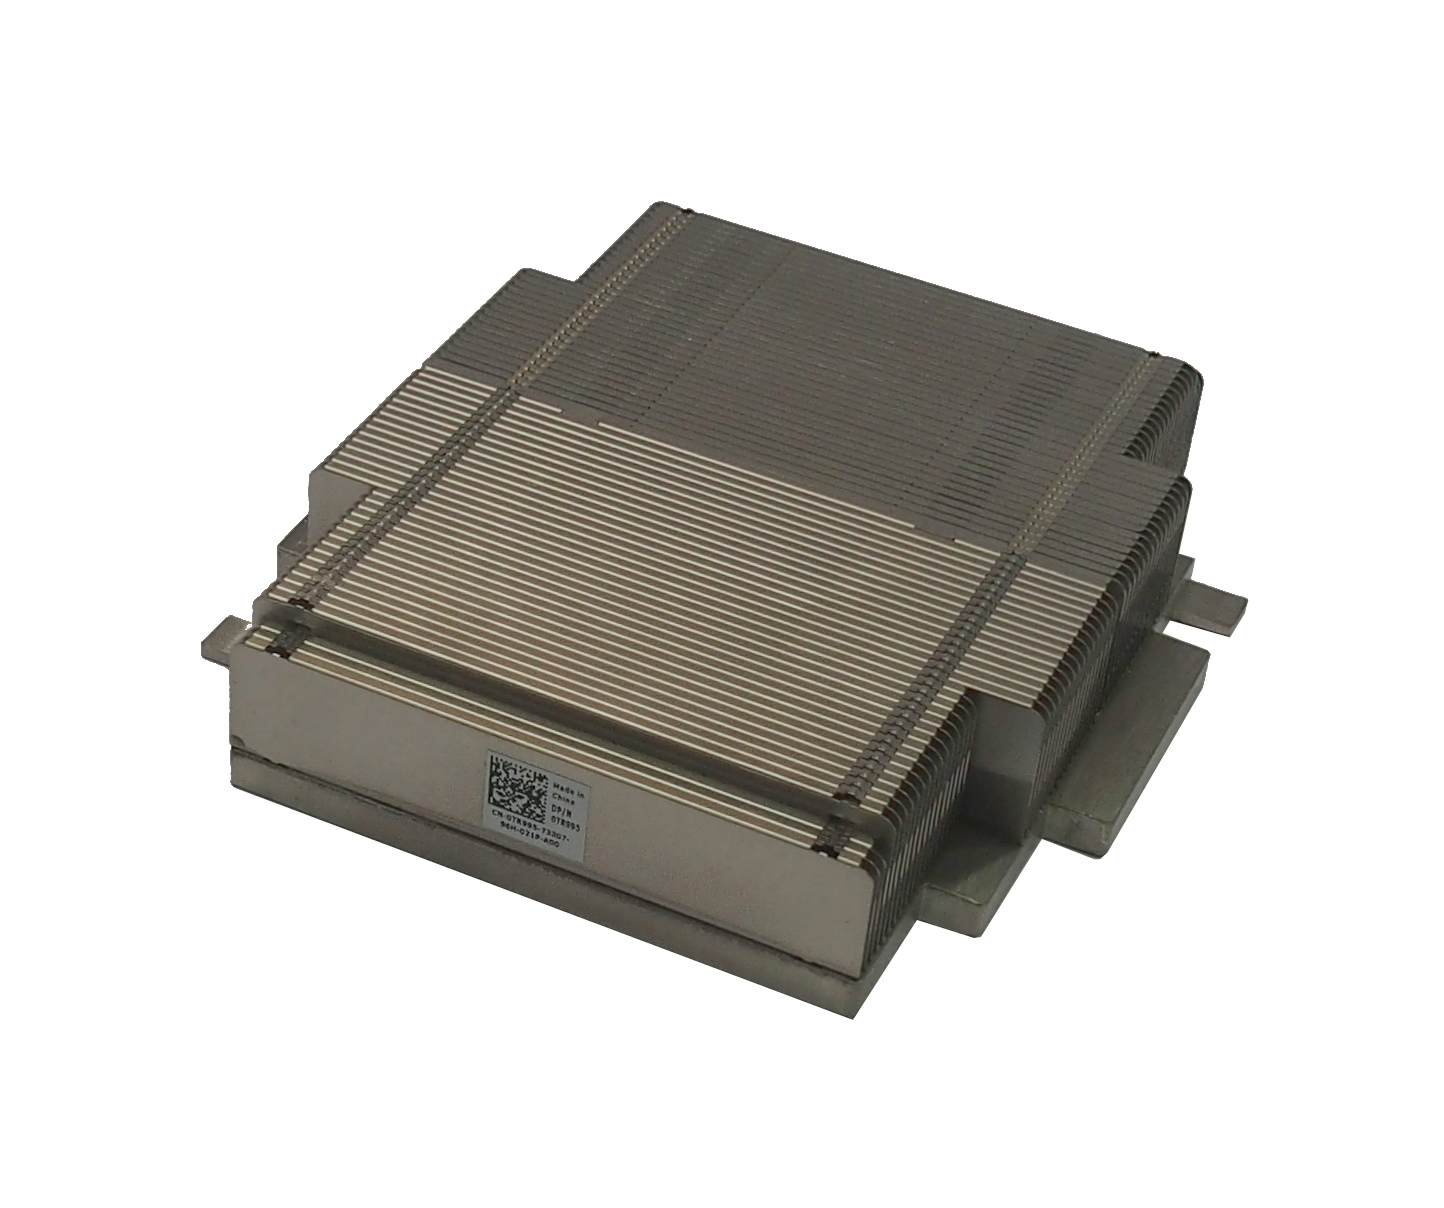 Dell TR995 CPU Heatsink For PowerEdge R610 Server